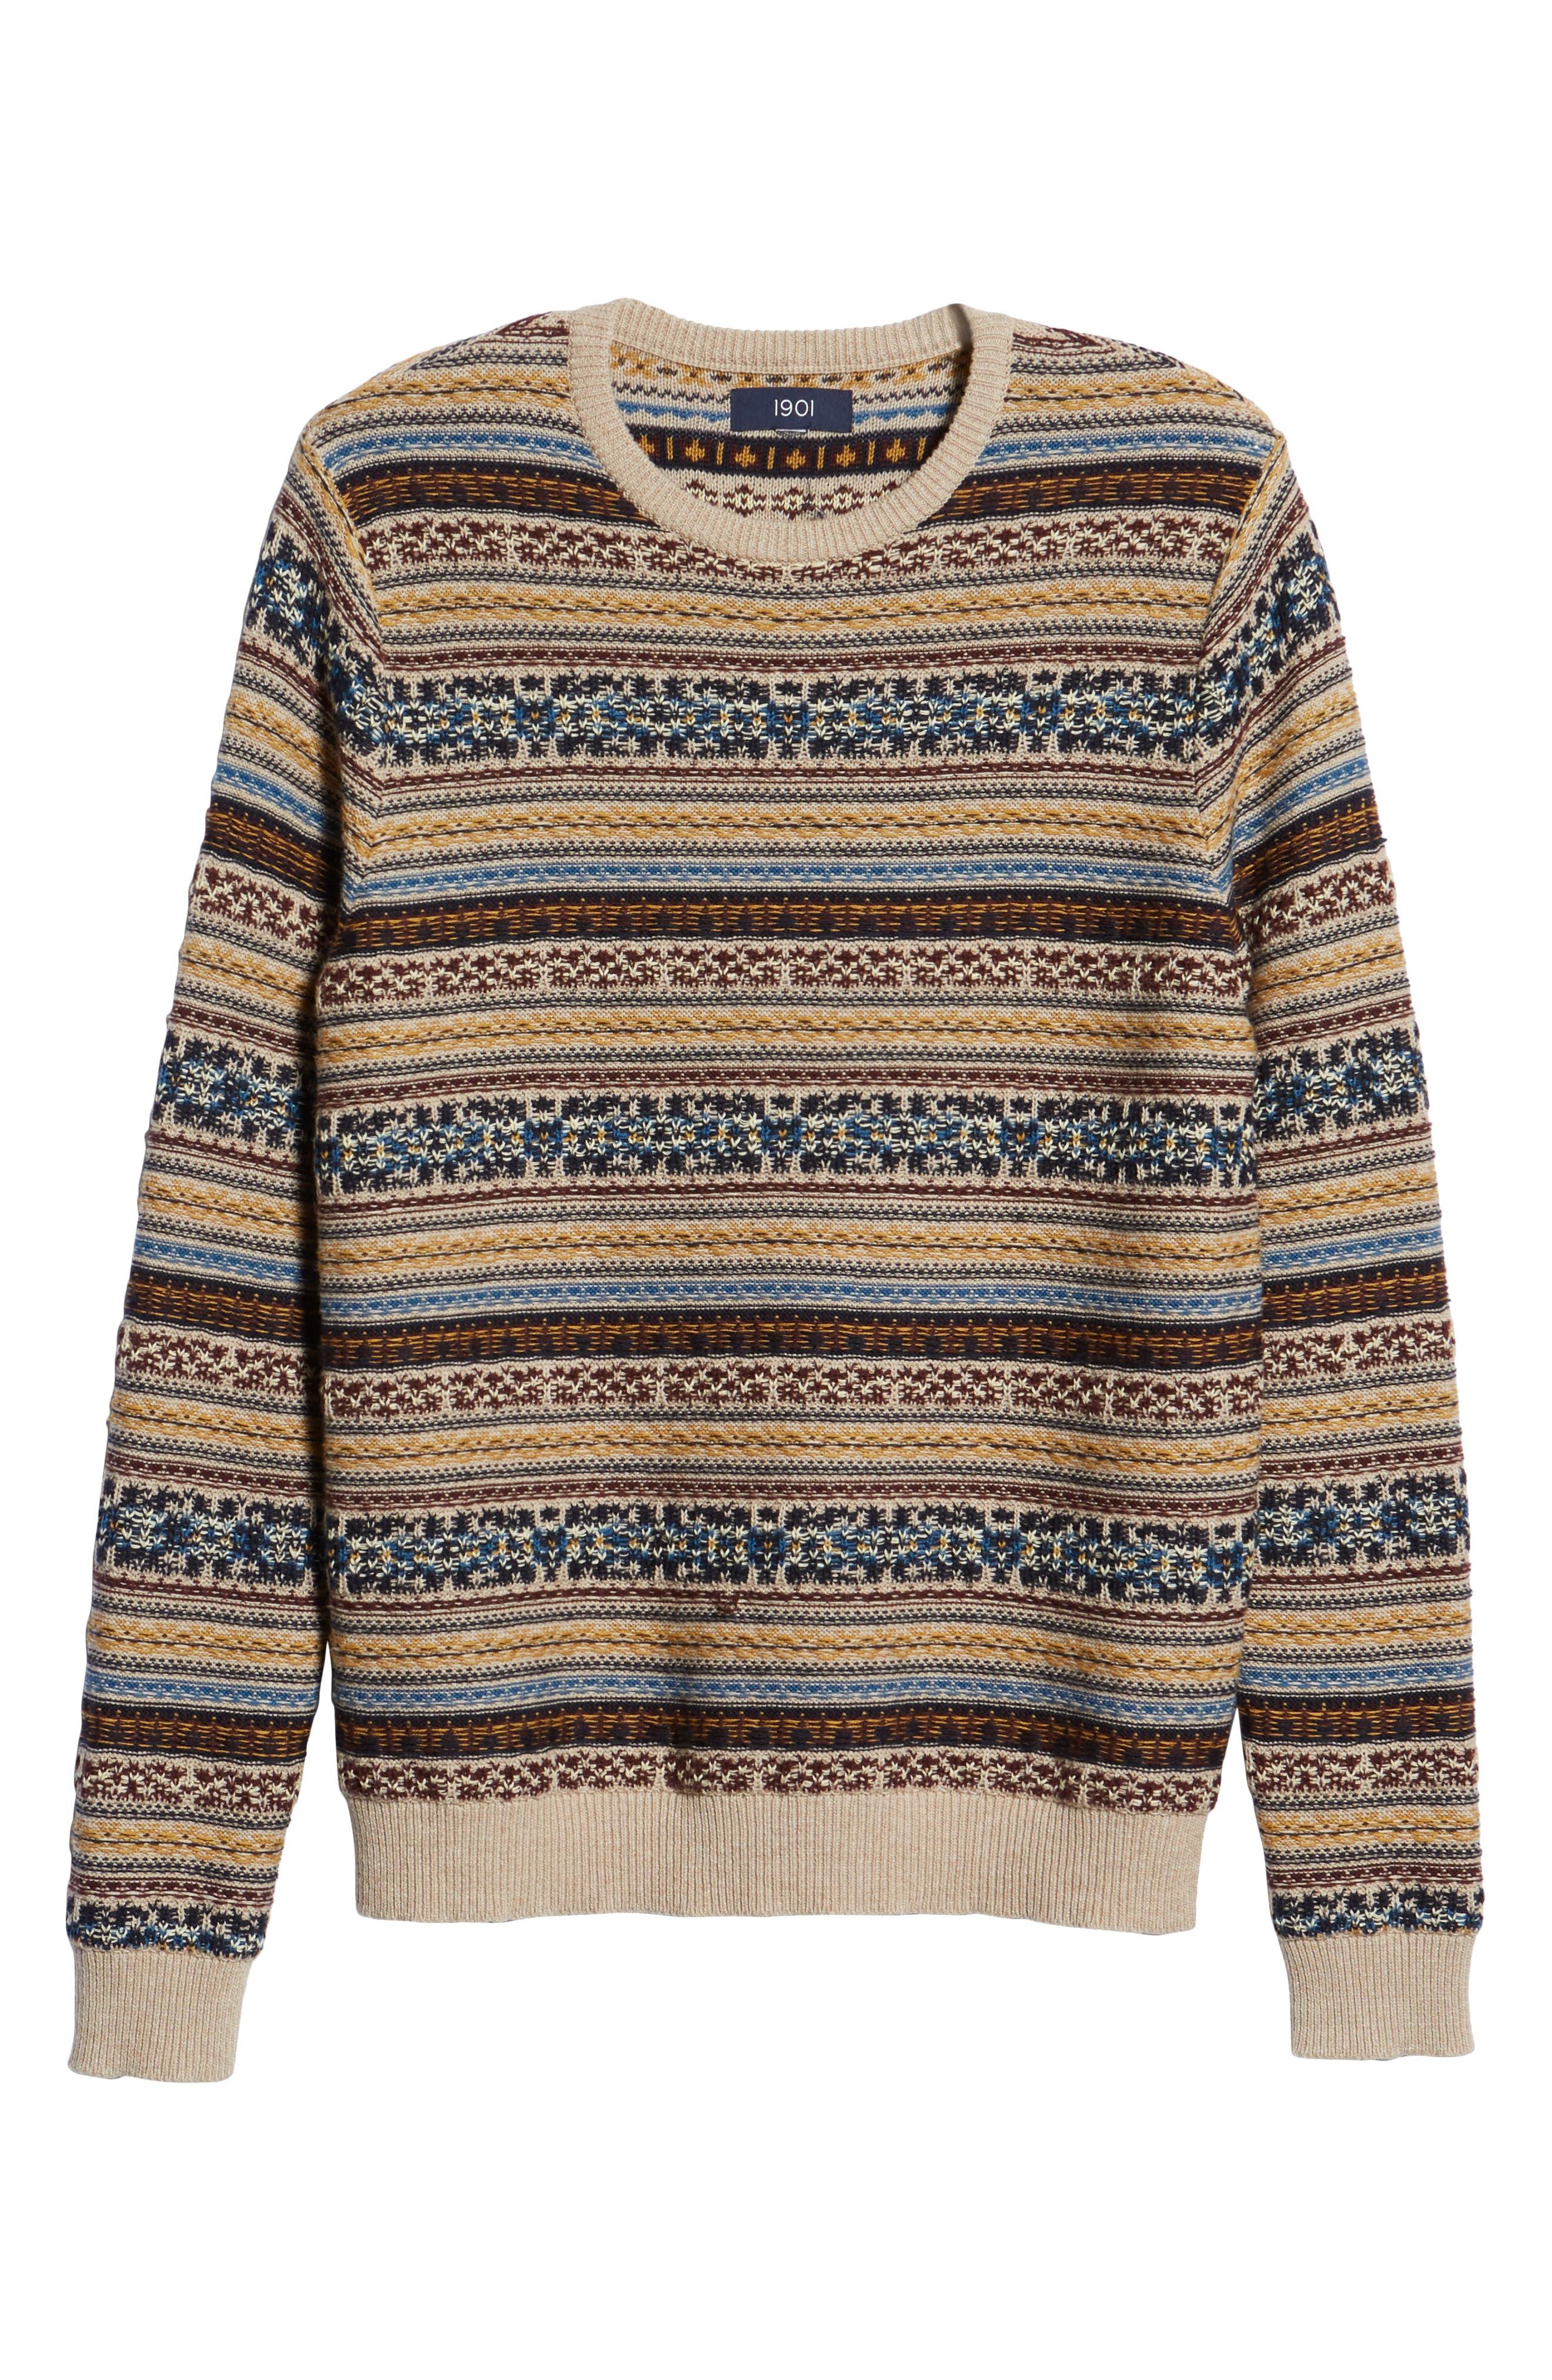 Regular Fit Fair Isle Crewneck Sweater,                             Alternate thumbnail 6, color,                             BROWN SIENA FAIRISLE